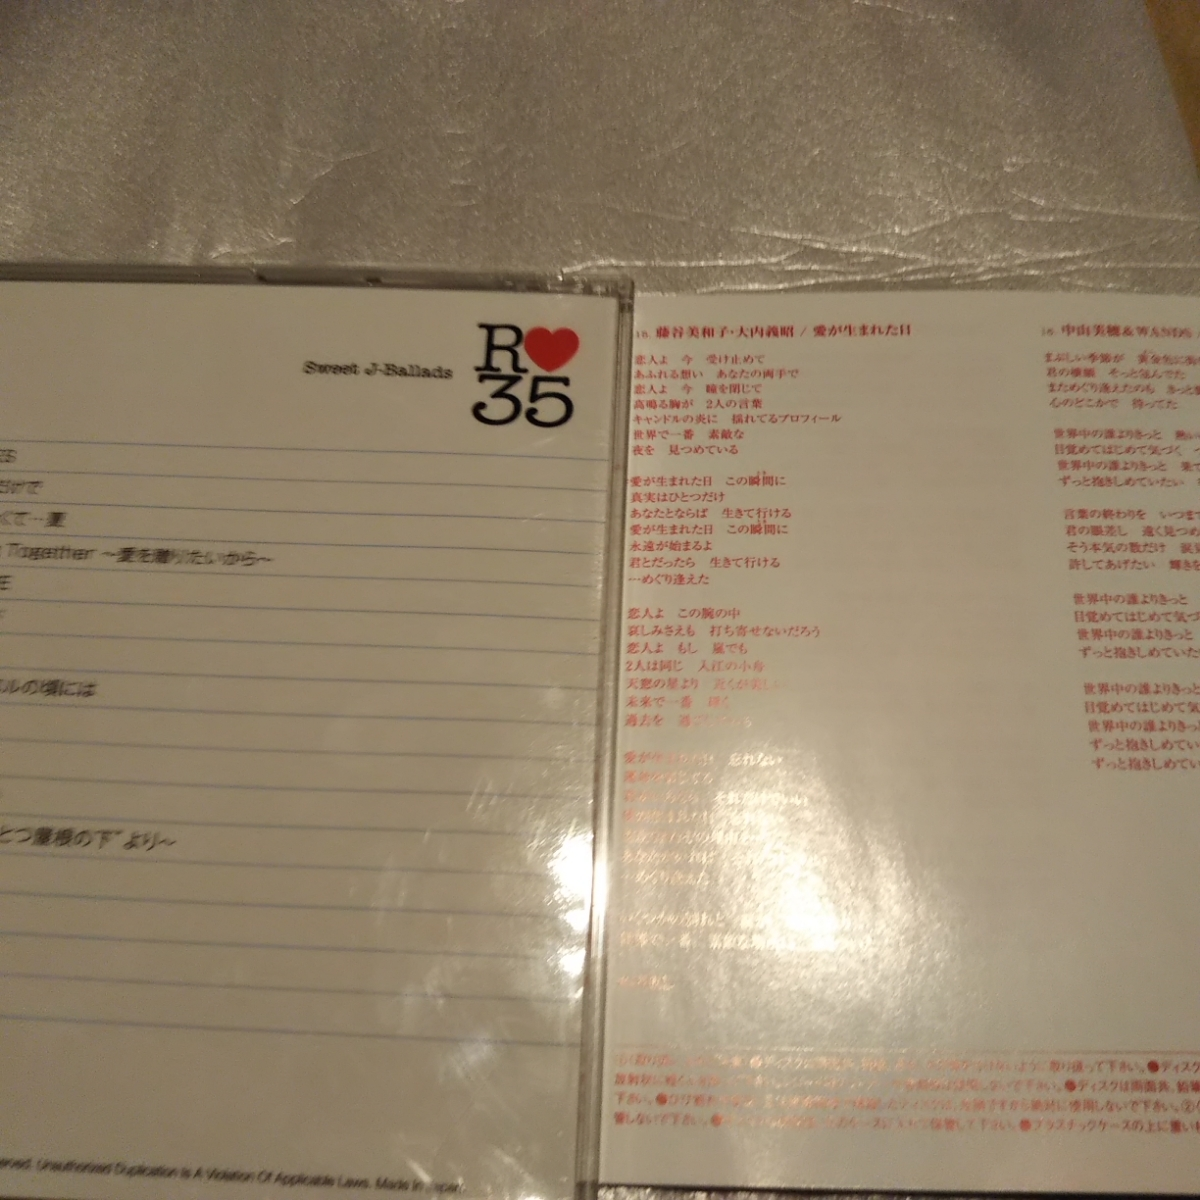 R35 Sweet J-Ballads CD CHAGE and ASKA 藤井フミヤ 米米CLUB 山根康広 T-BOLAN 稲垣潤一 class 徳永英明 槇原敬之 90年代 J-POP_画像5